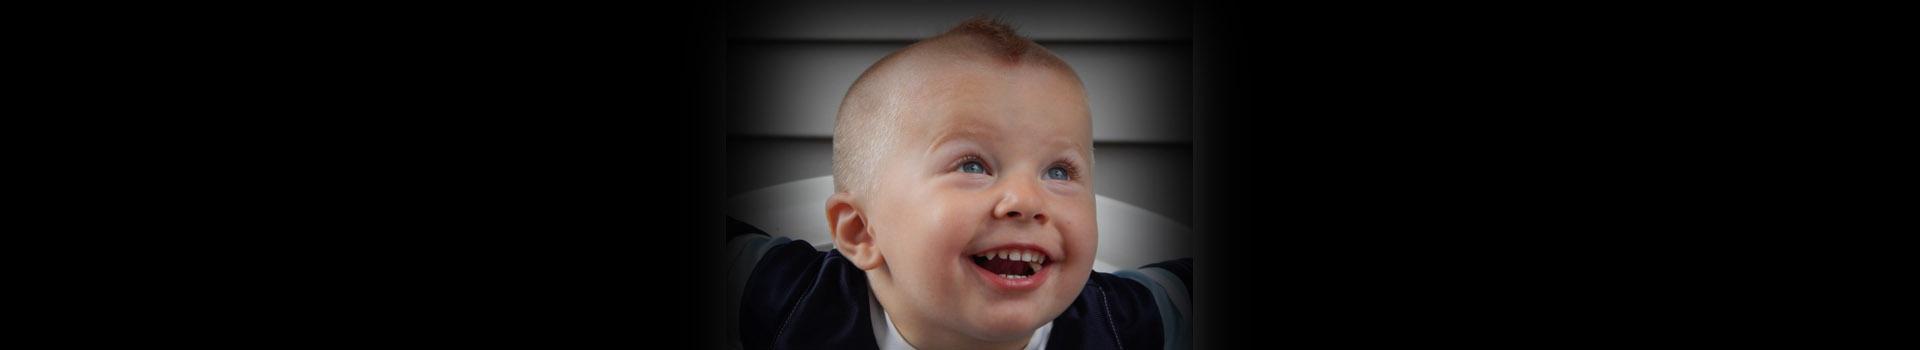 smilingboy